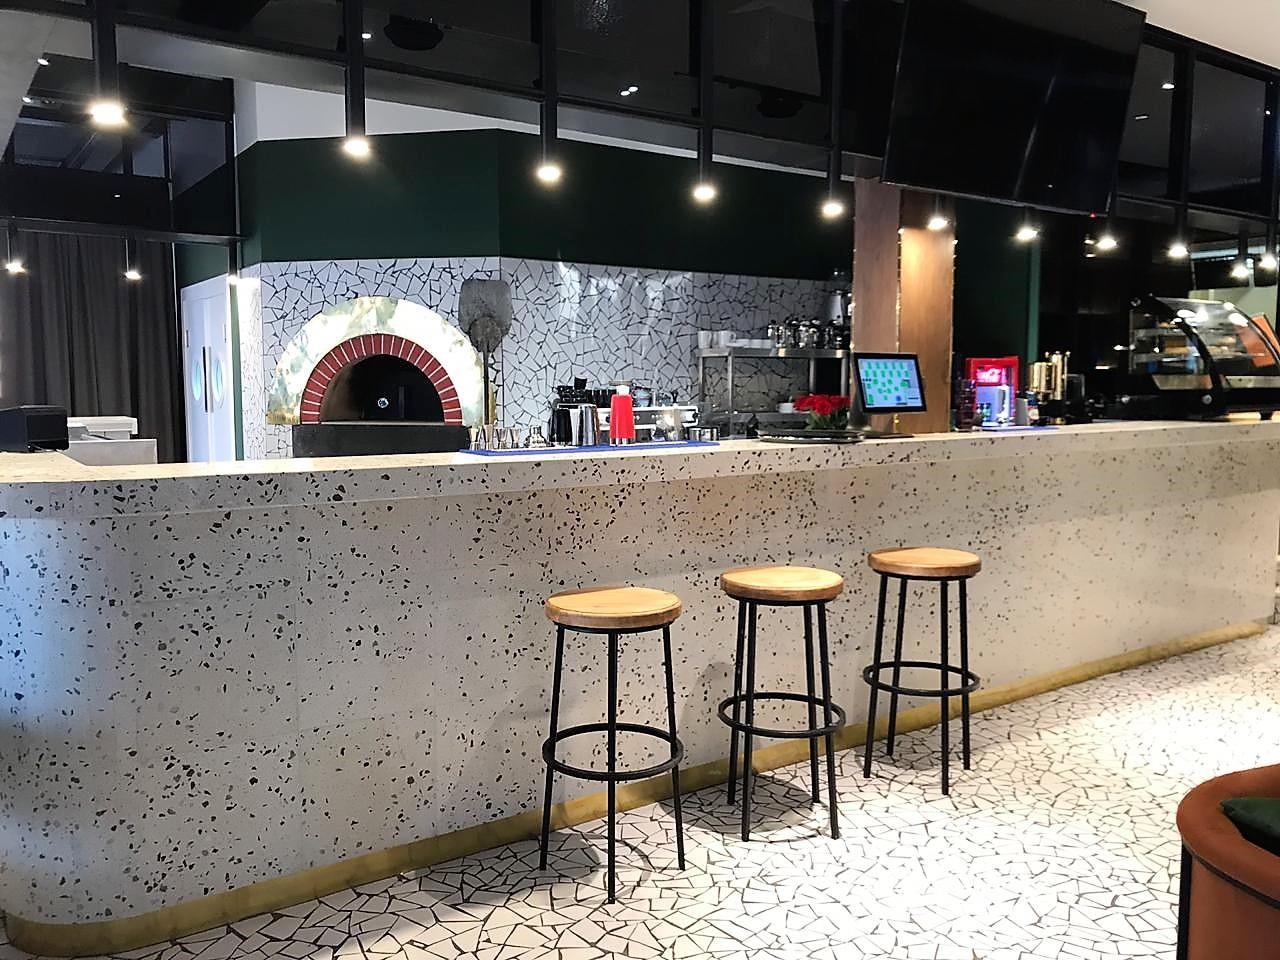 Лебовски Пицца и Боулинг - работа по укладке плитки терраццо